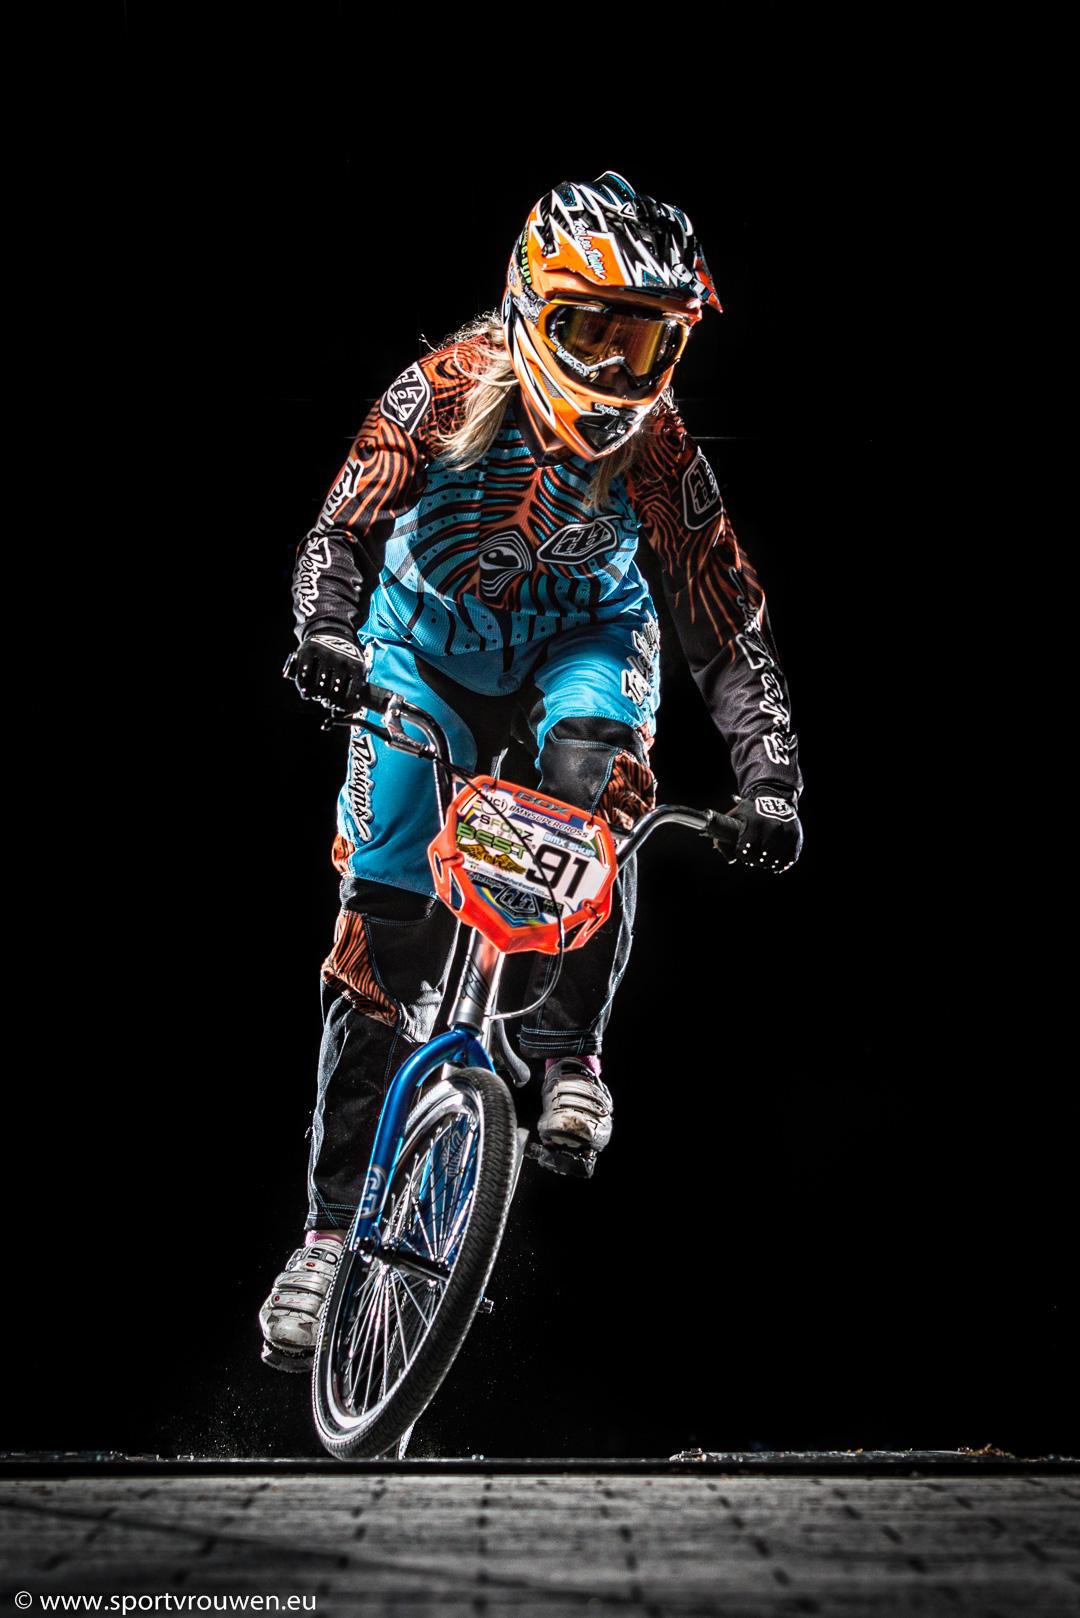 Sportvrouwen - BMX